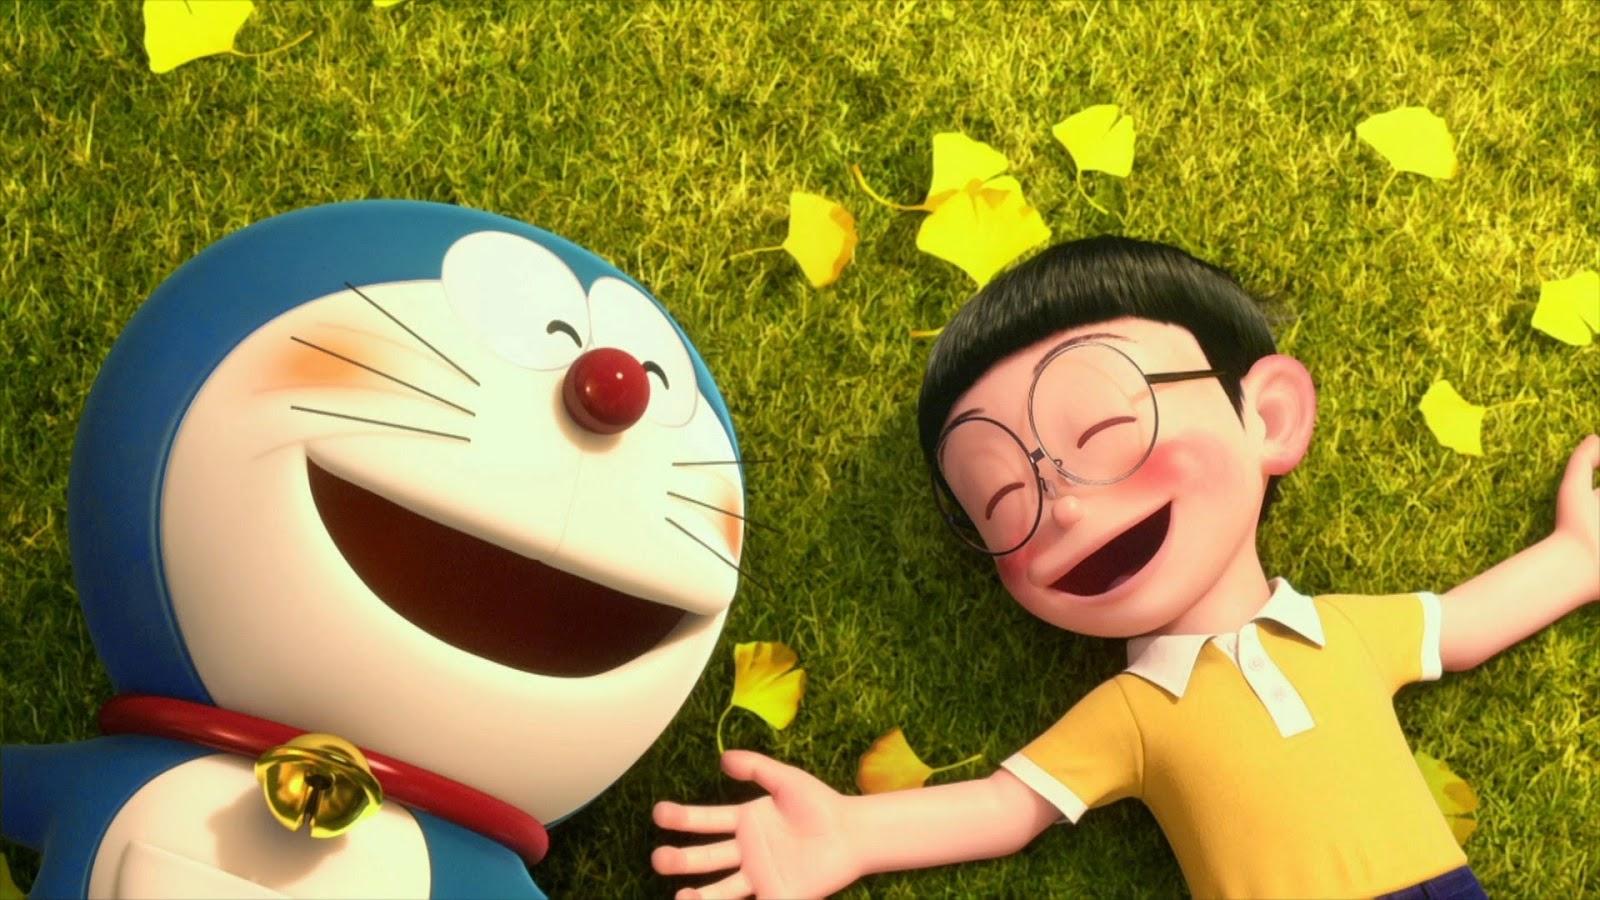 Gambar Doraemon Lengkap